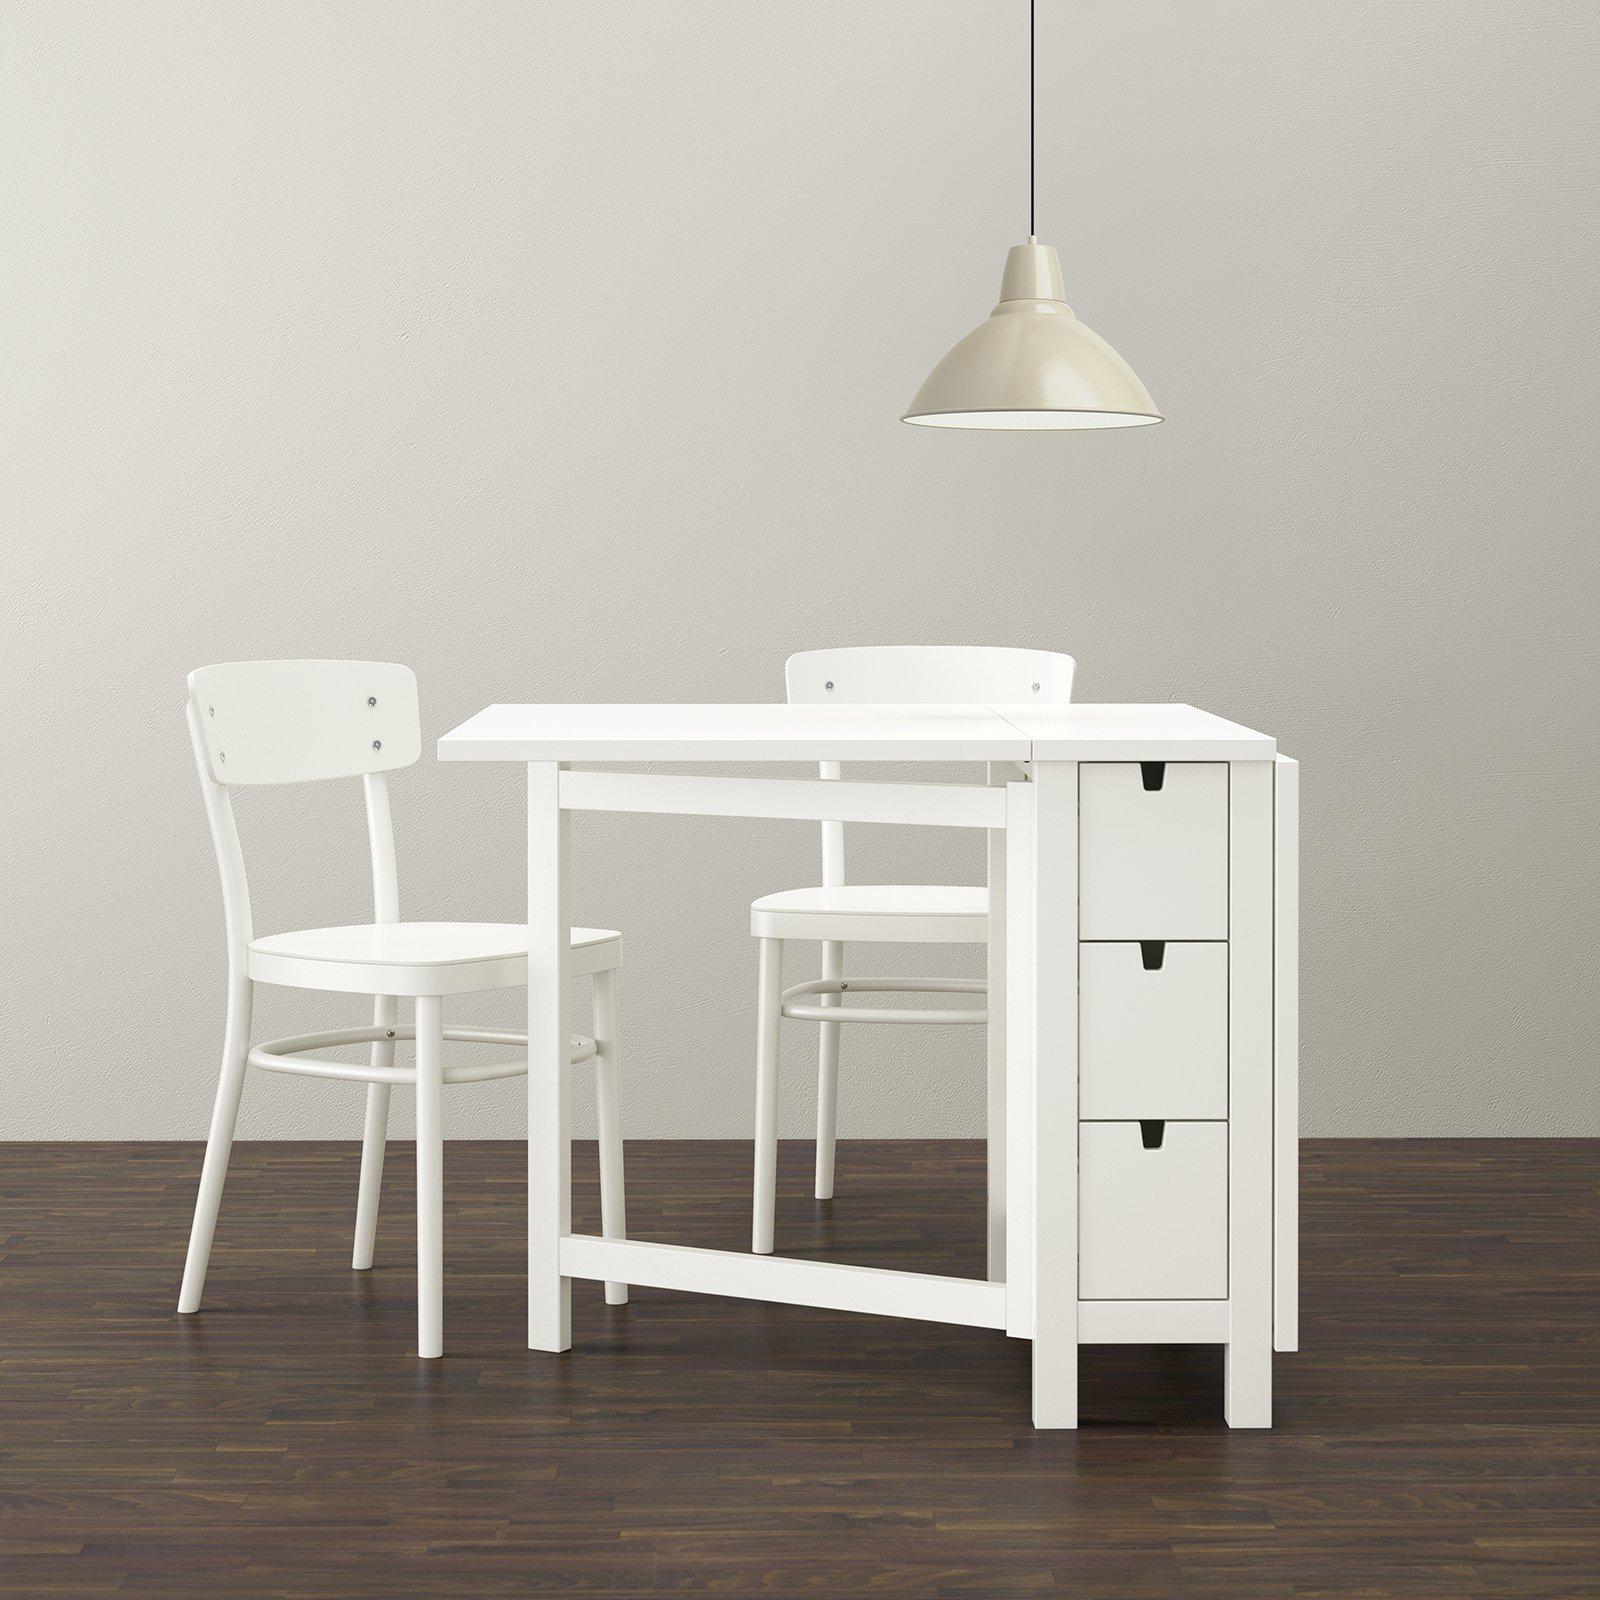 Tavoli bianchi allungabili beautiful p moderno prodotti tavoli tavoli allungabili moderni legno - Tavolo ikea quadrato ...